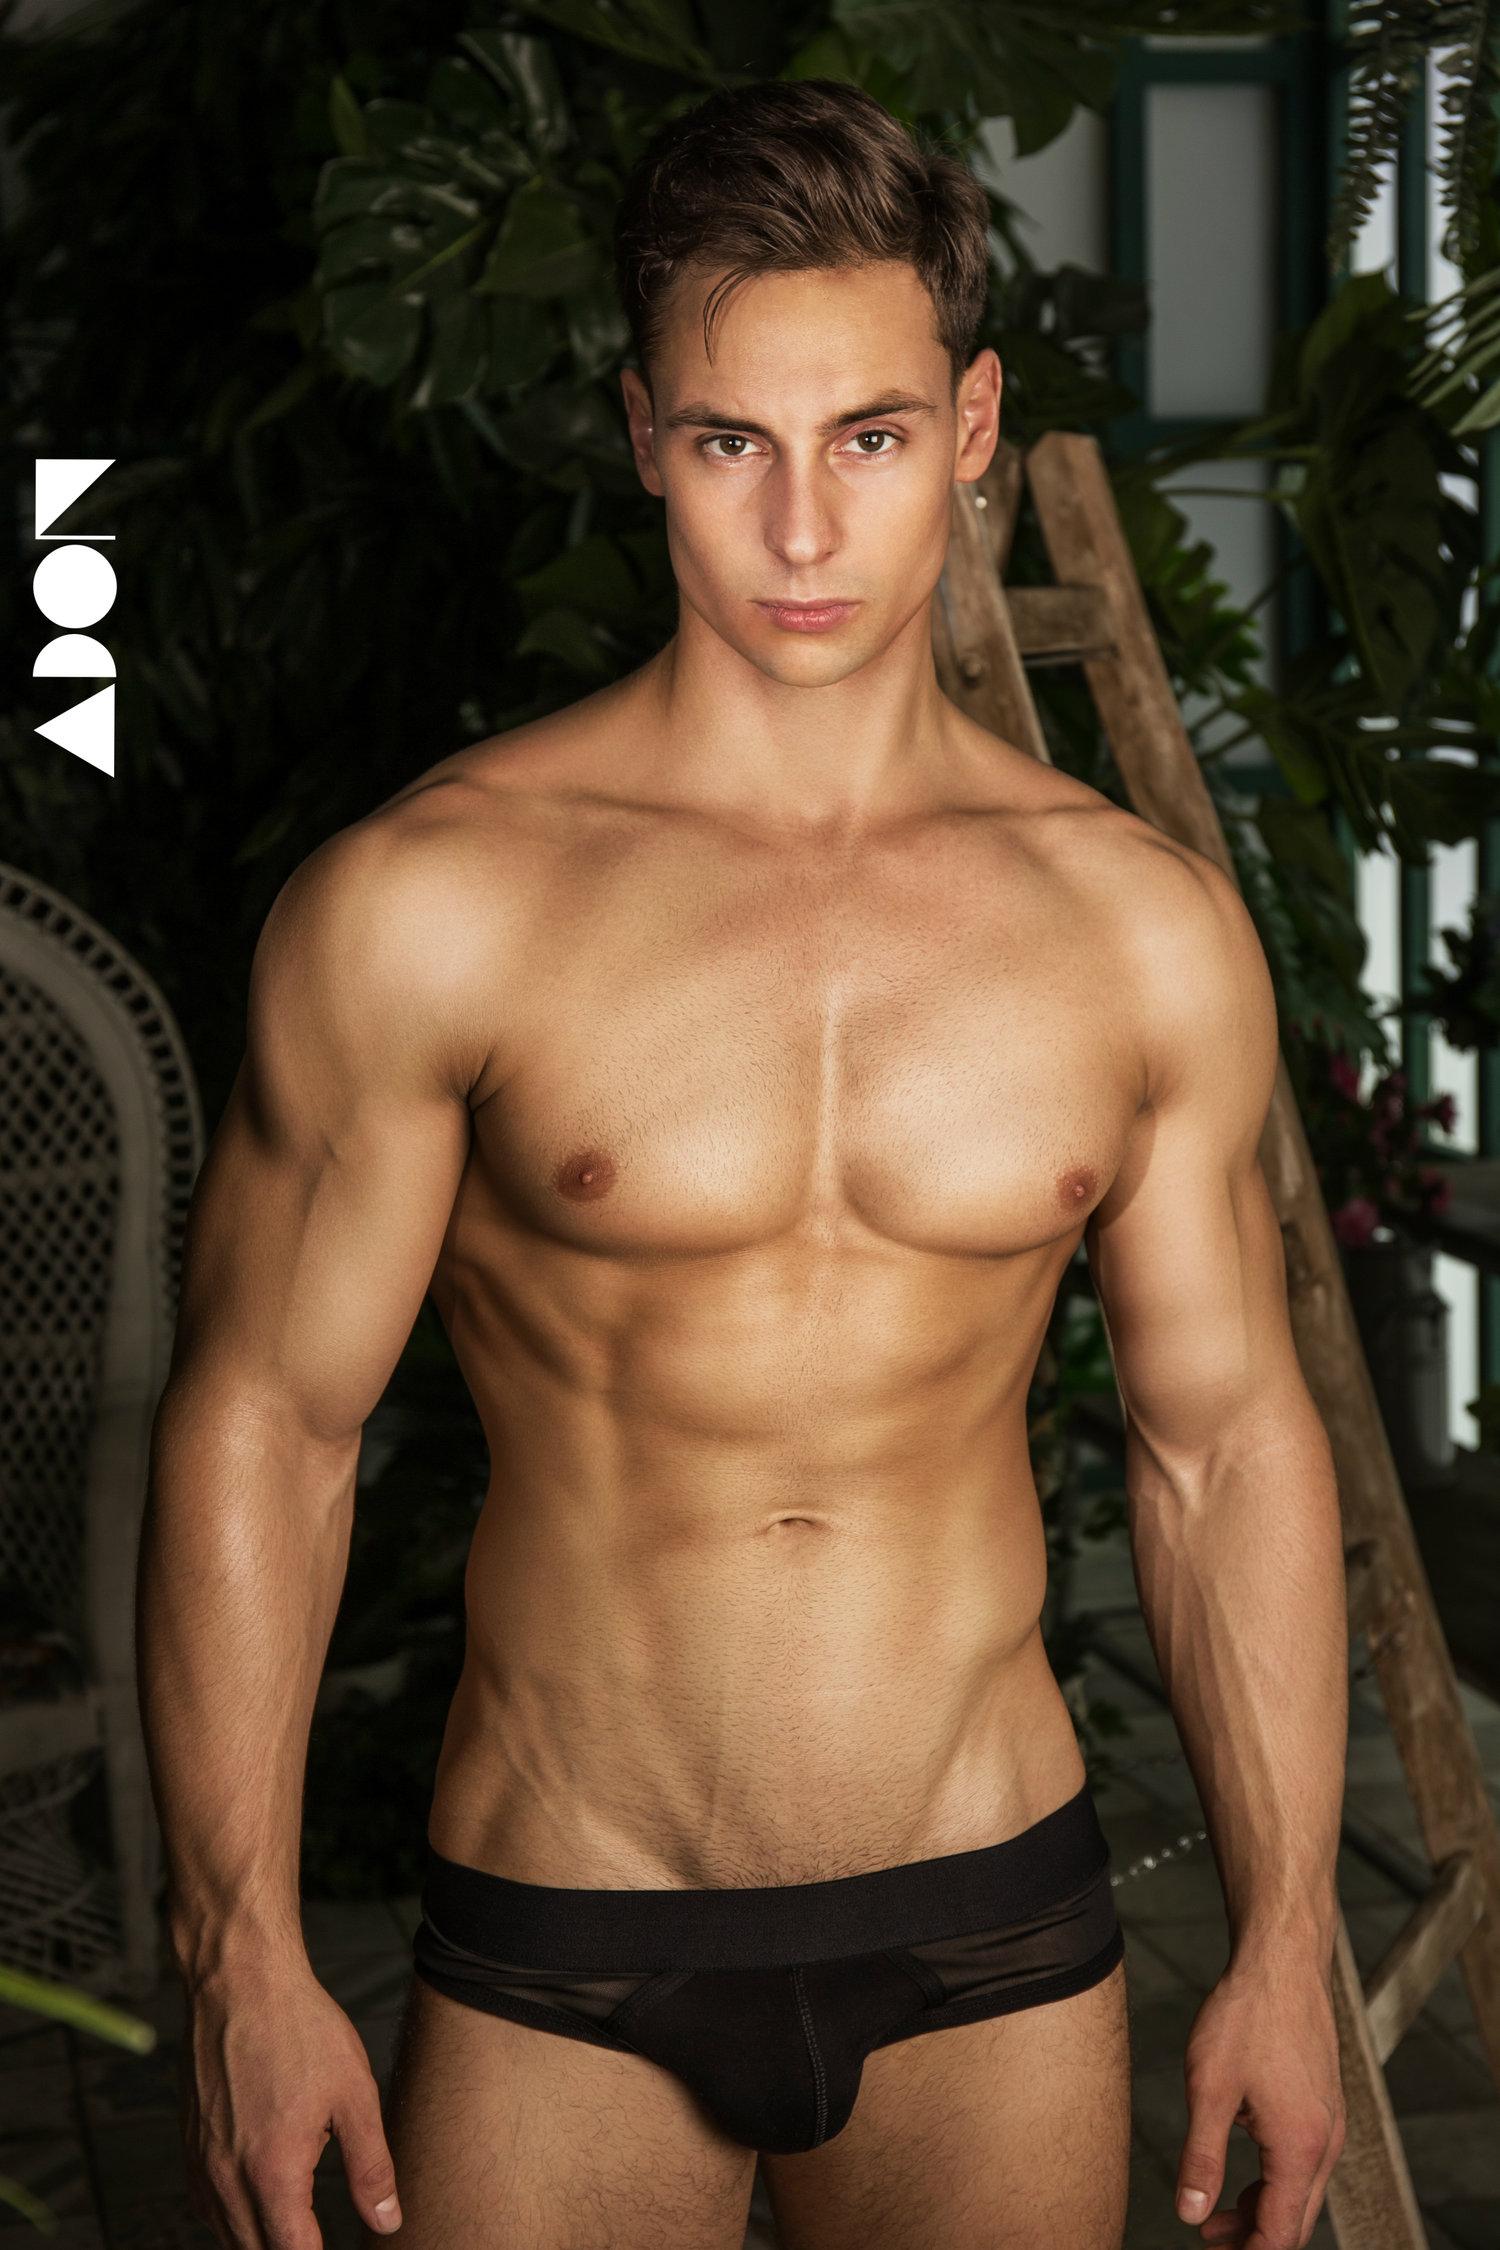 Adon Exclusive: Model Vladimir By Stas Vokman